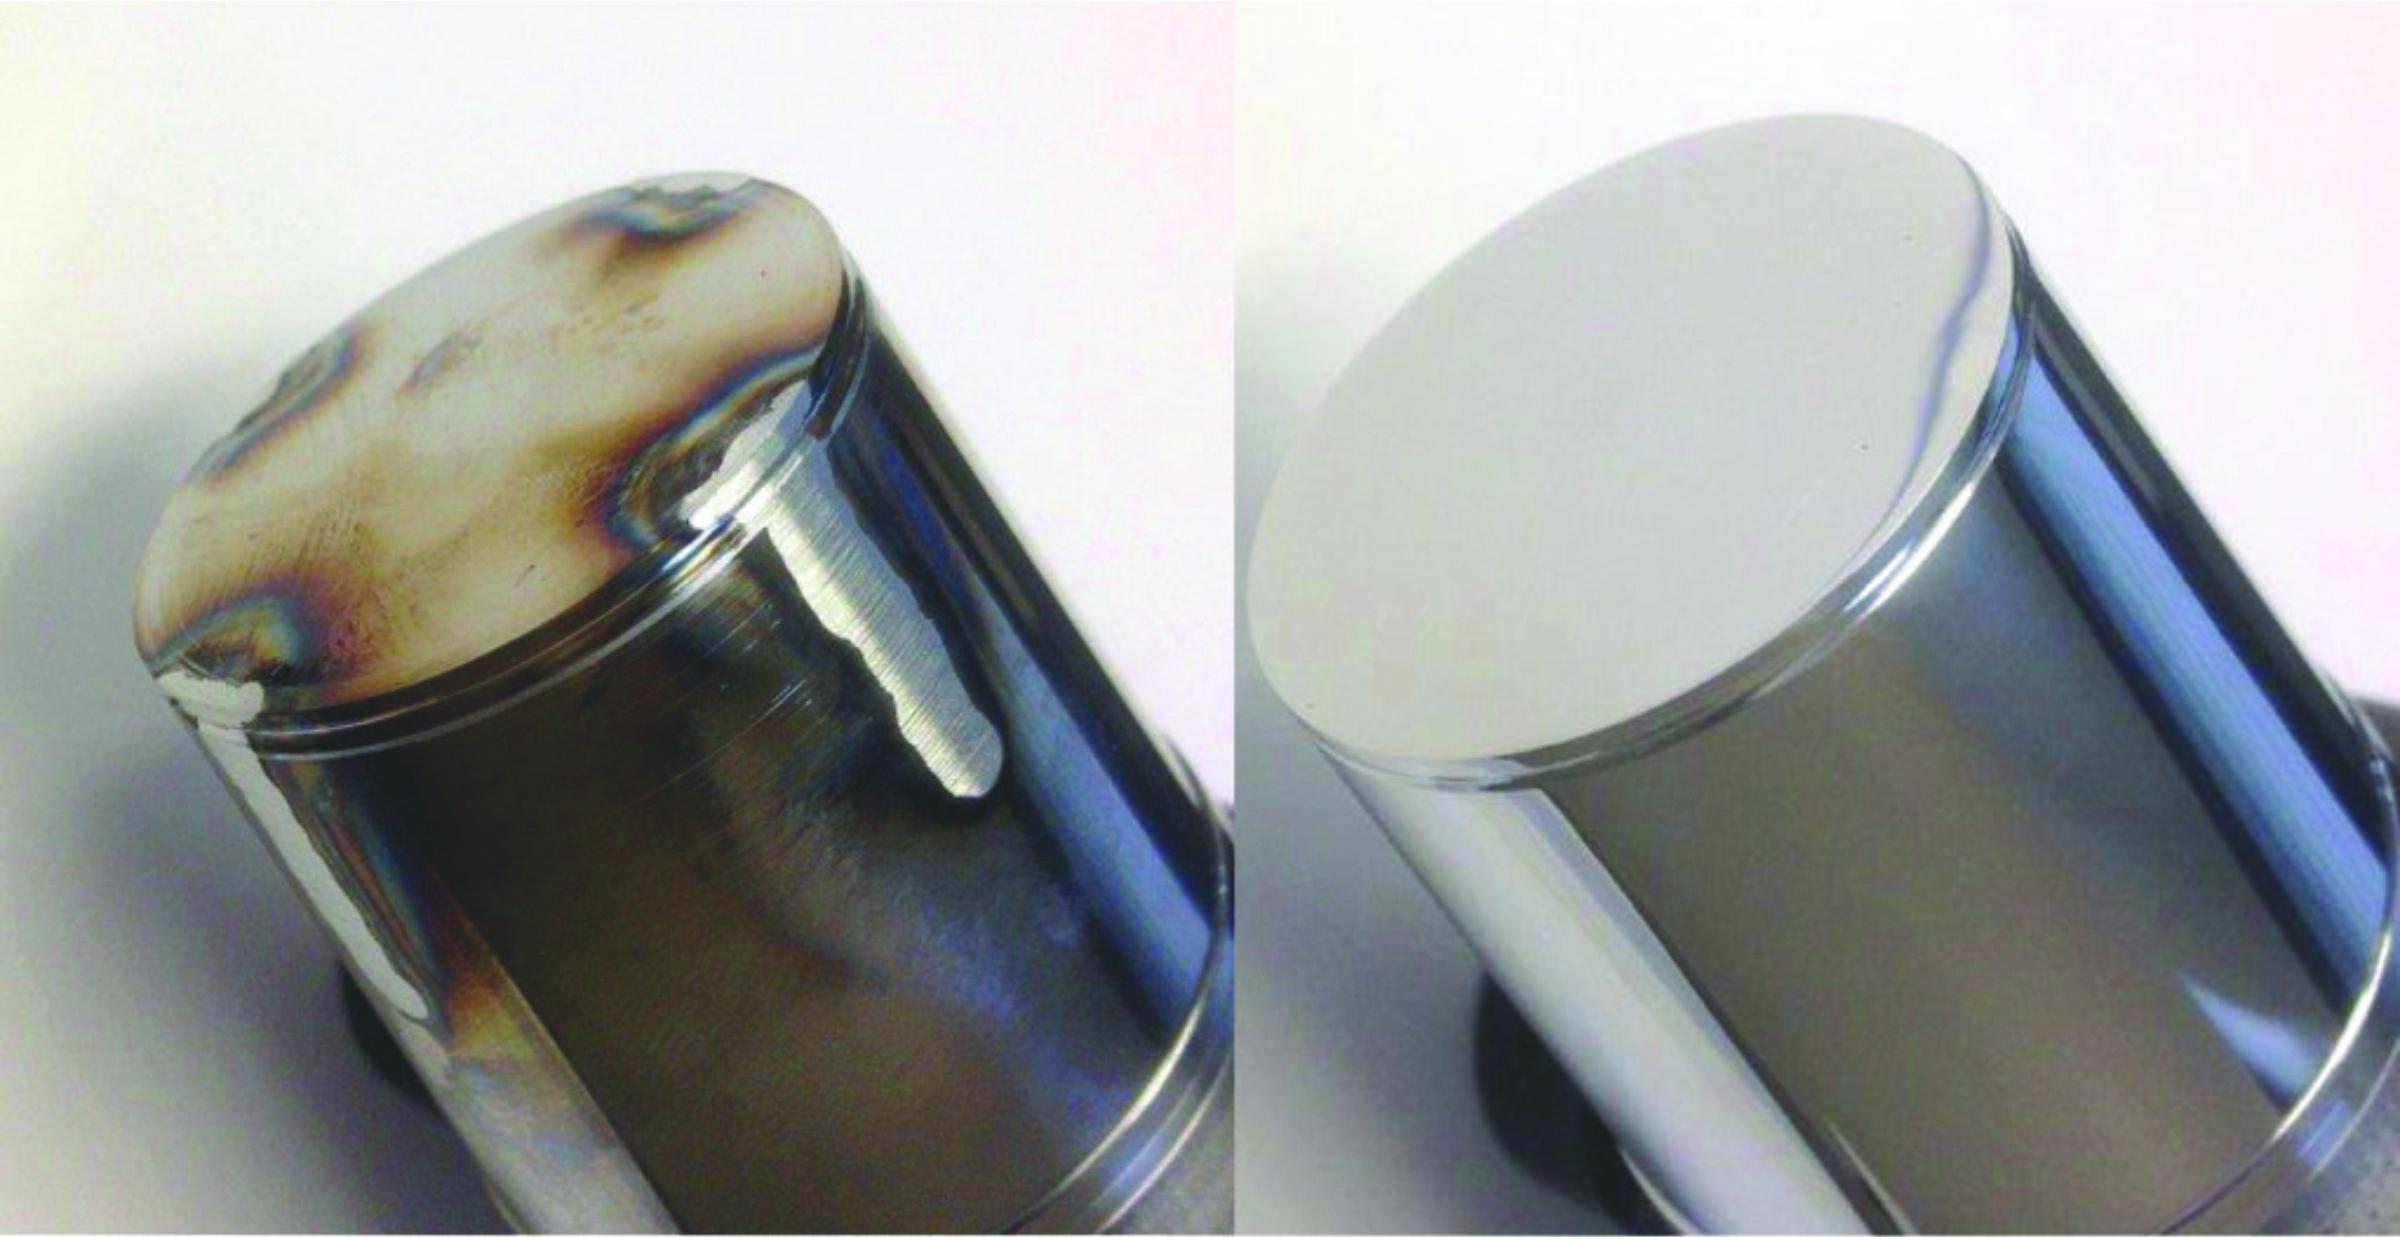 Maintenance, Repair and Surface Treatment